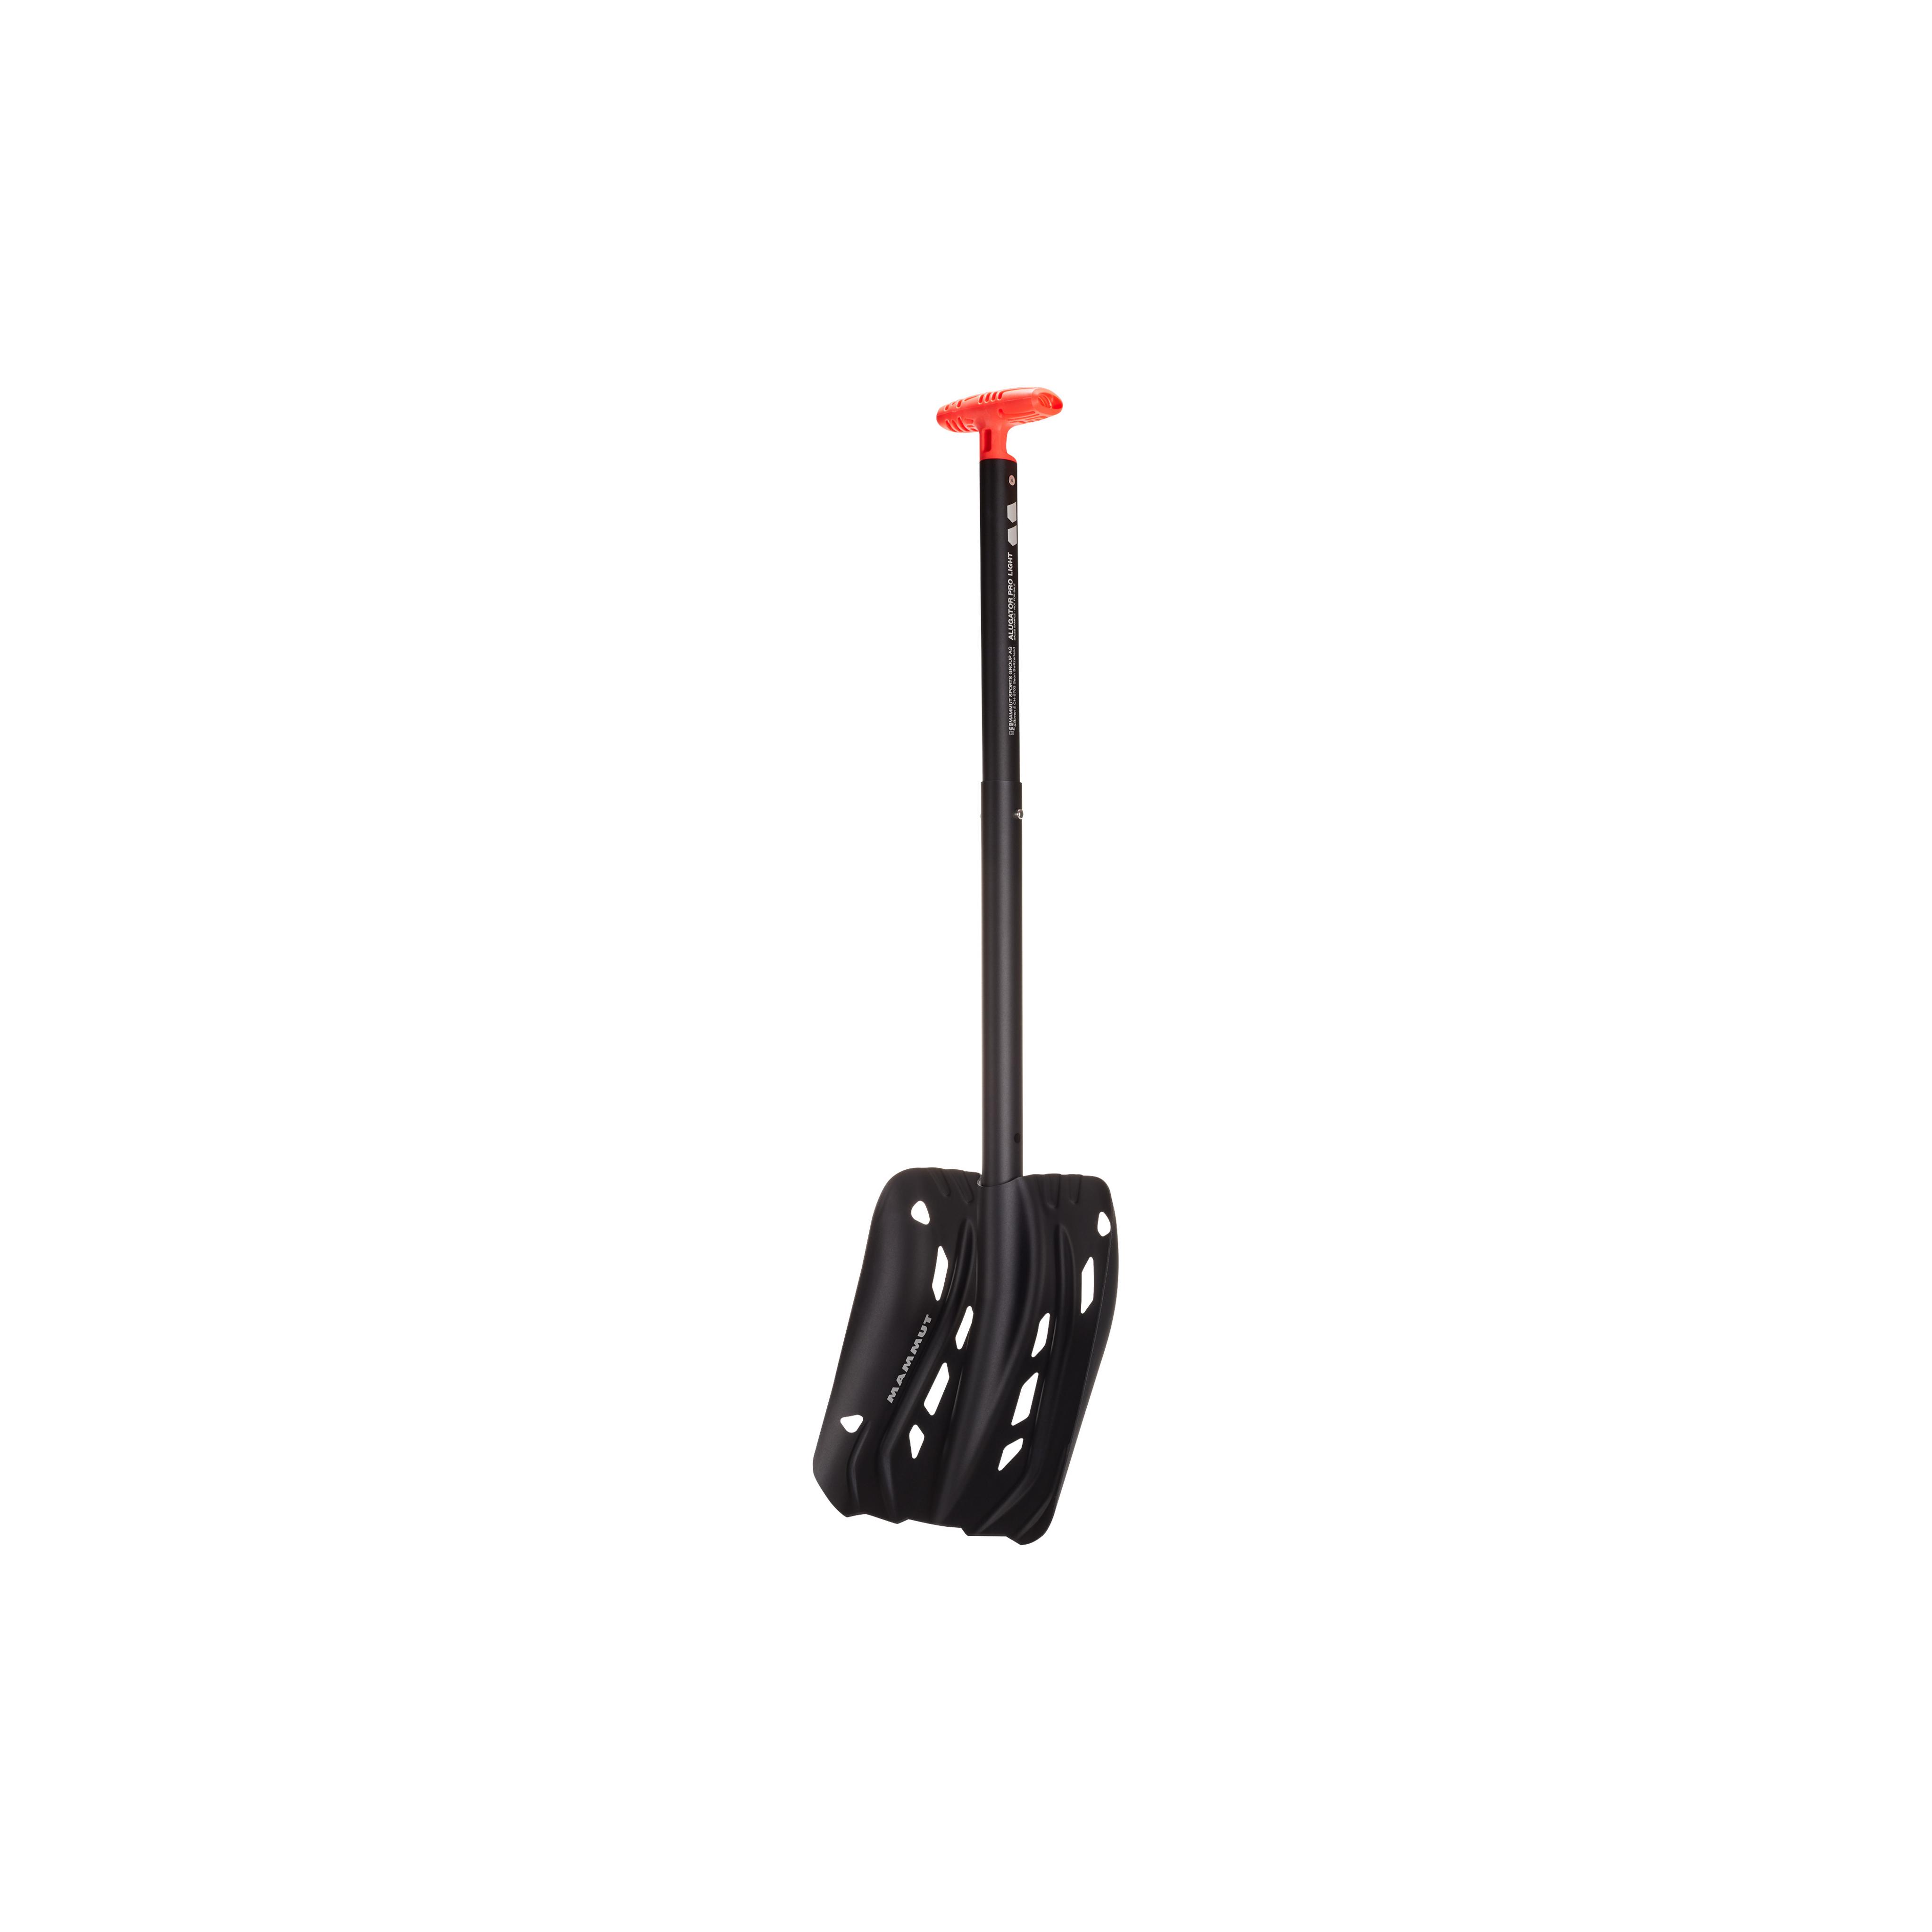 Alugator Pro Light - black, one size thumbnail